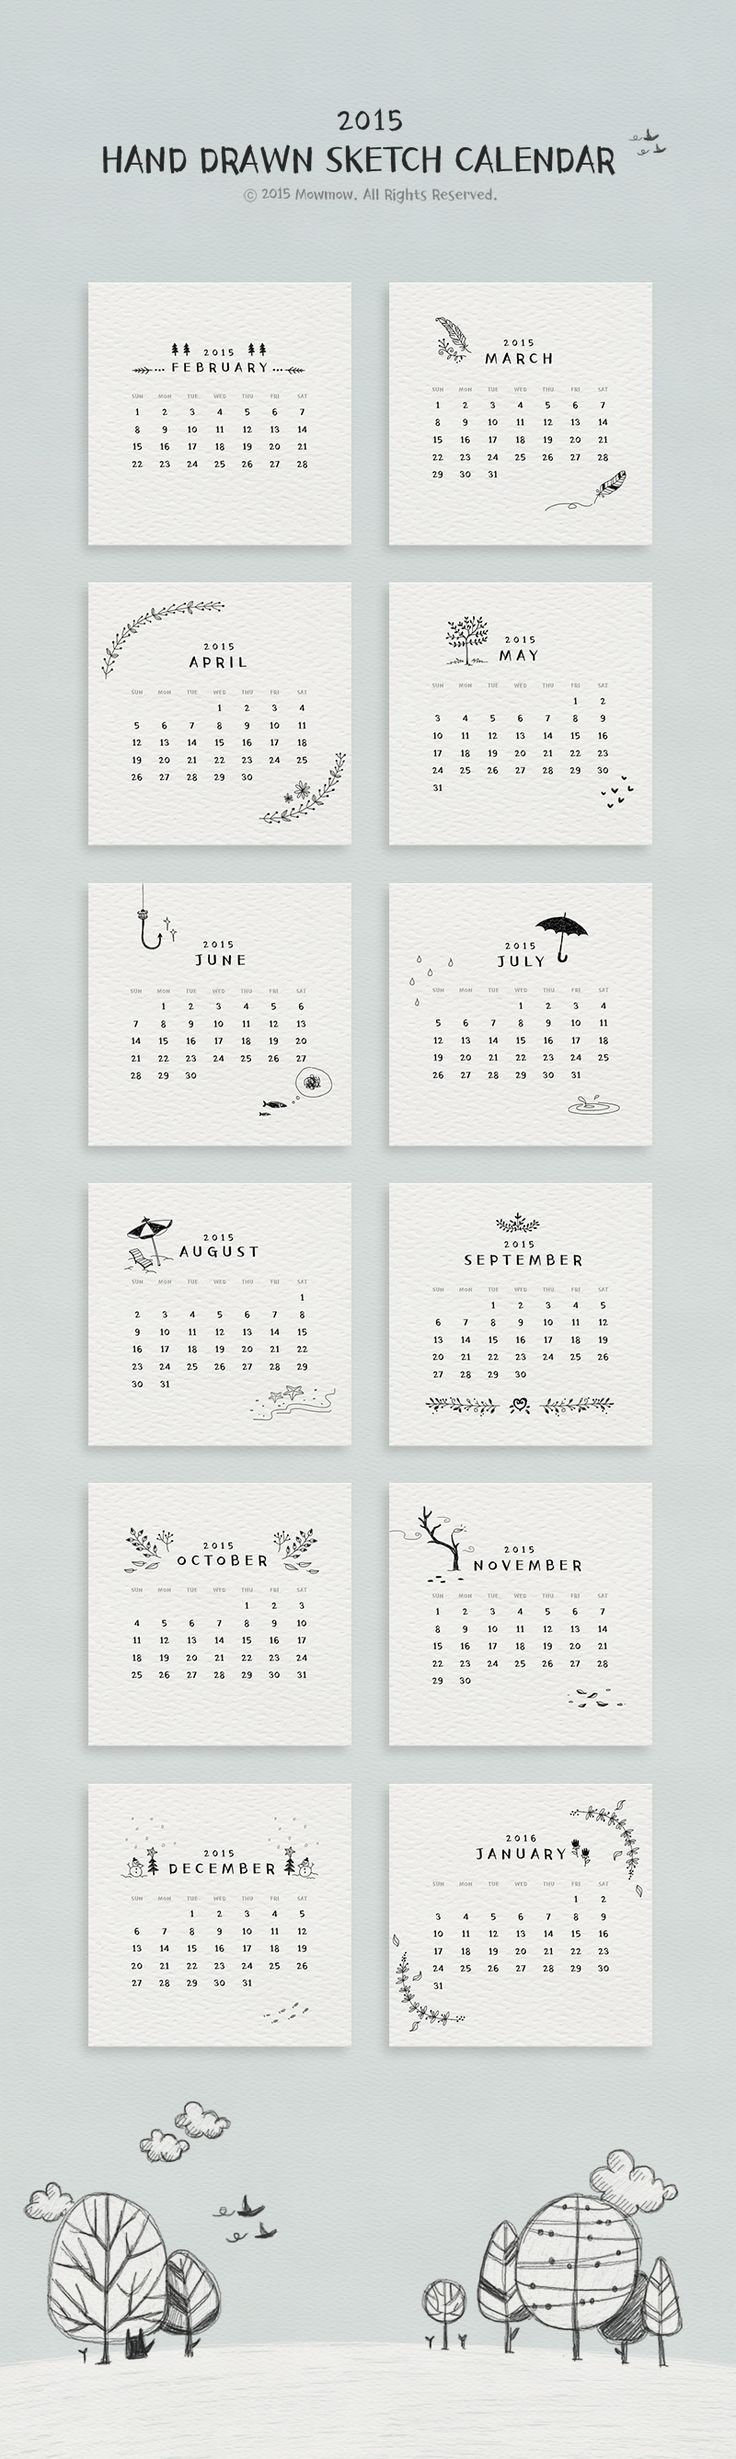 Hand drawn sketch 2015 calendar on Behance